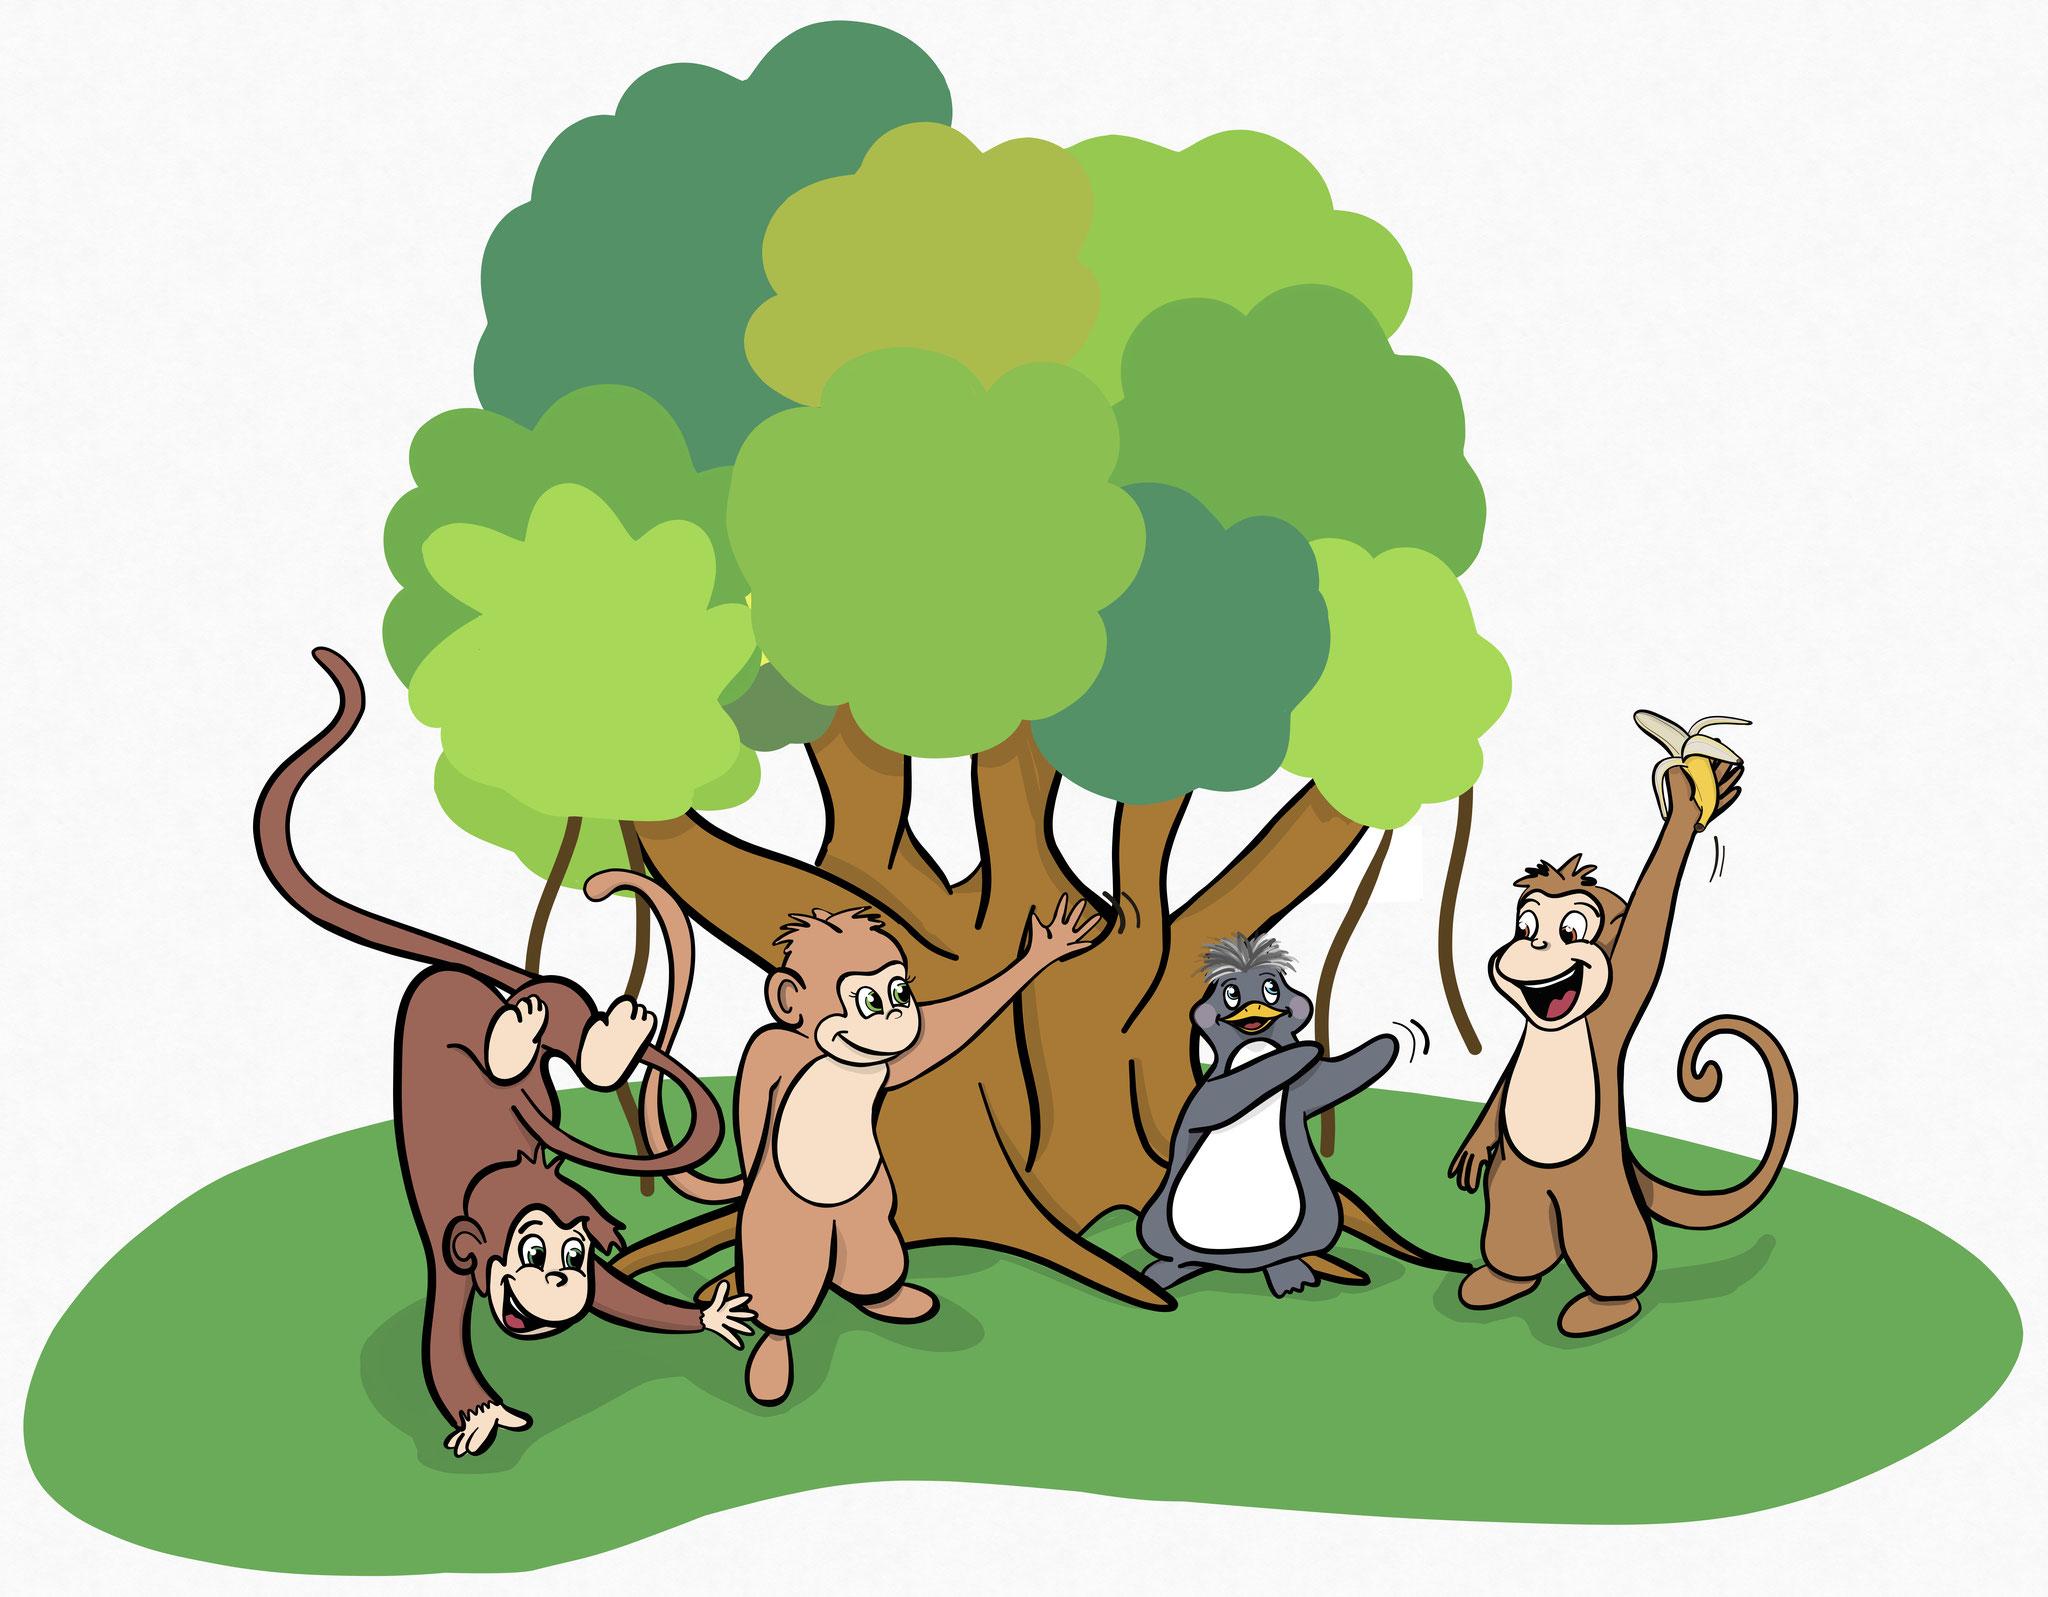 Affengeschwister Kido, Kada und Kodo